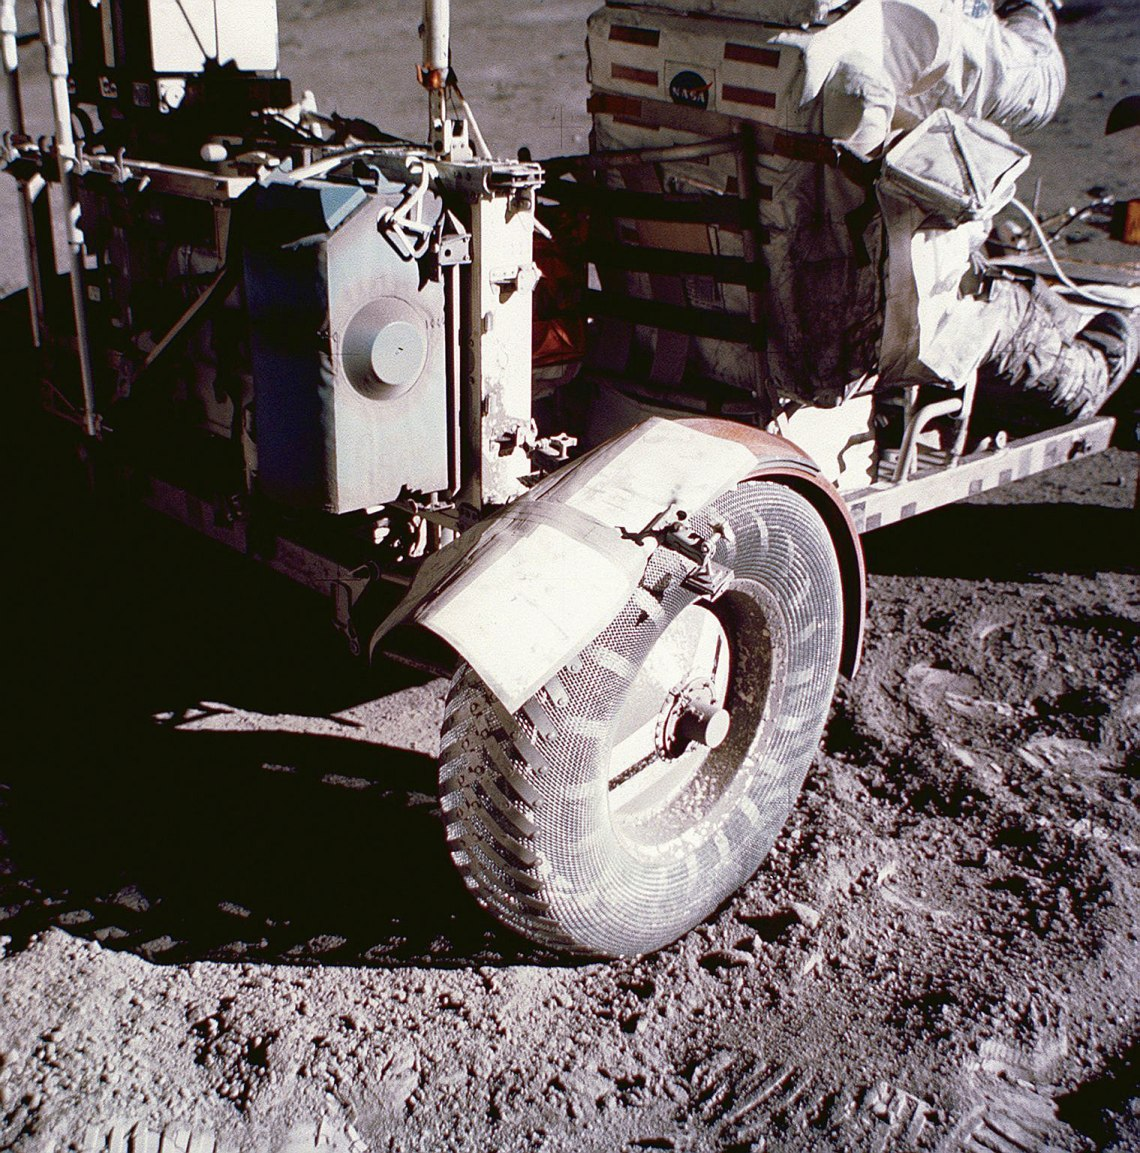 The improvised new fender. Credit: NASA